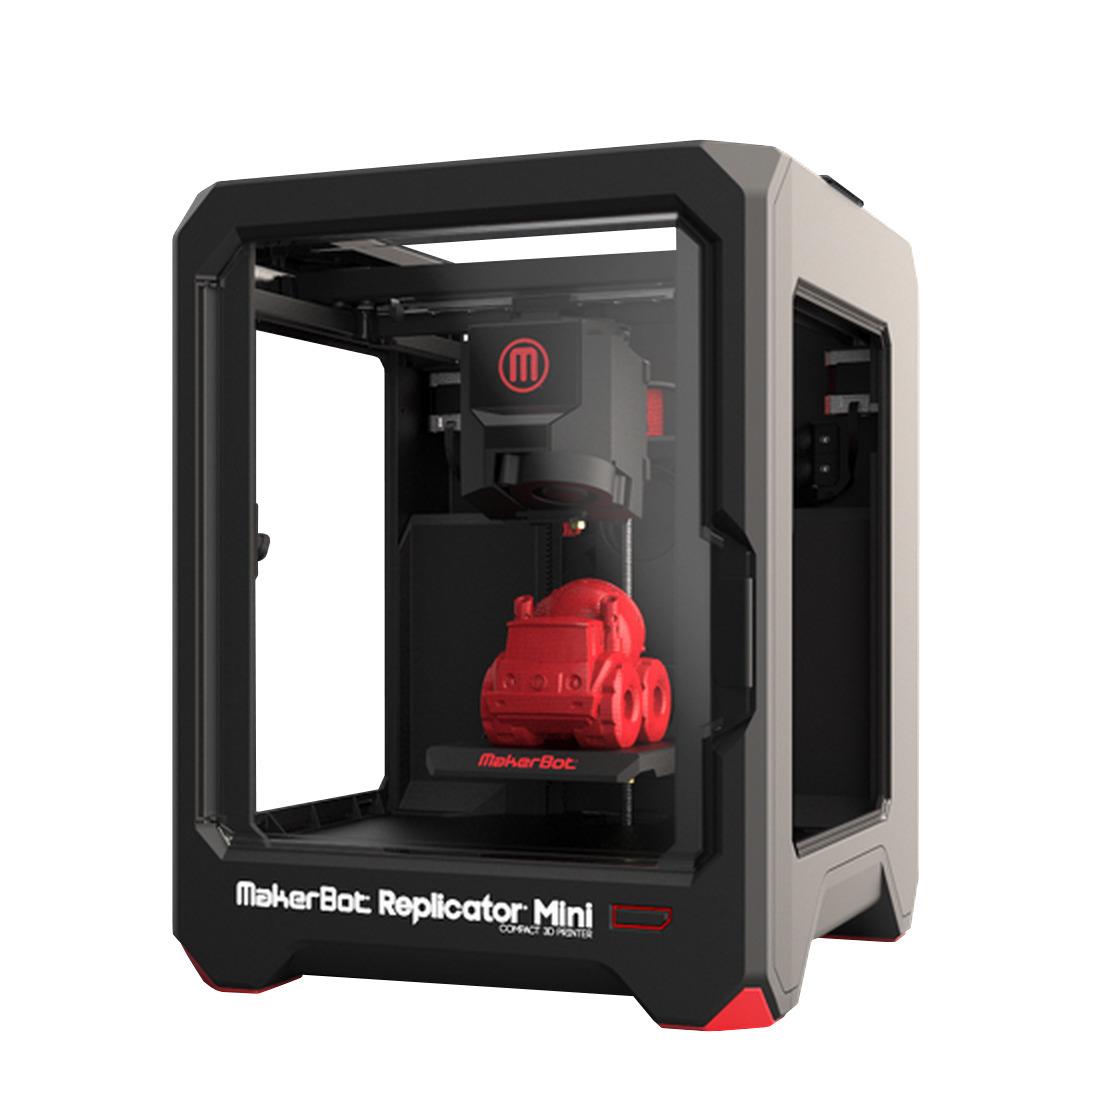 www.makerbot.com